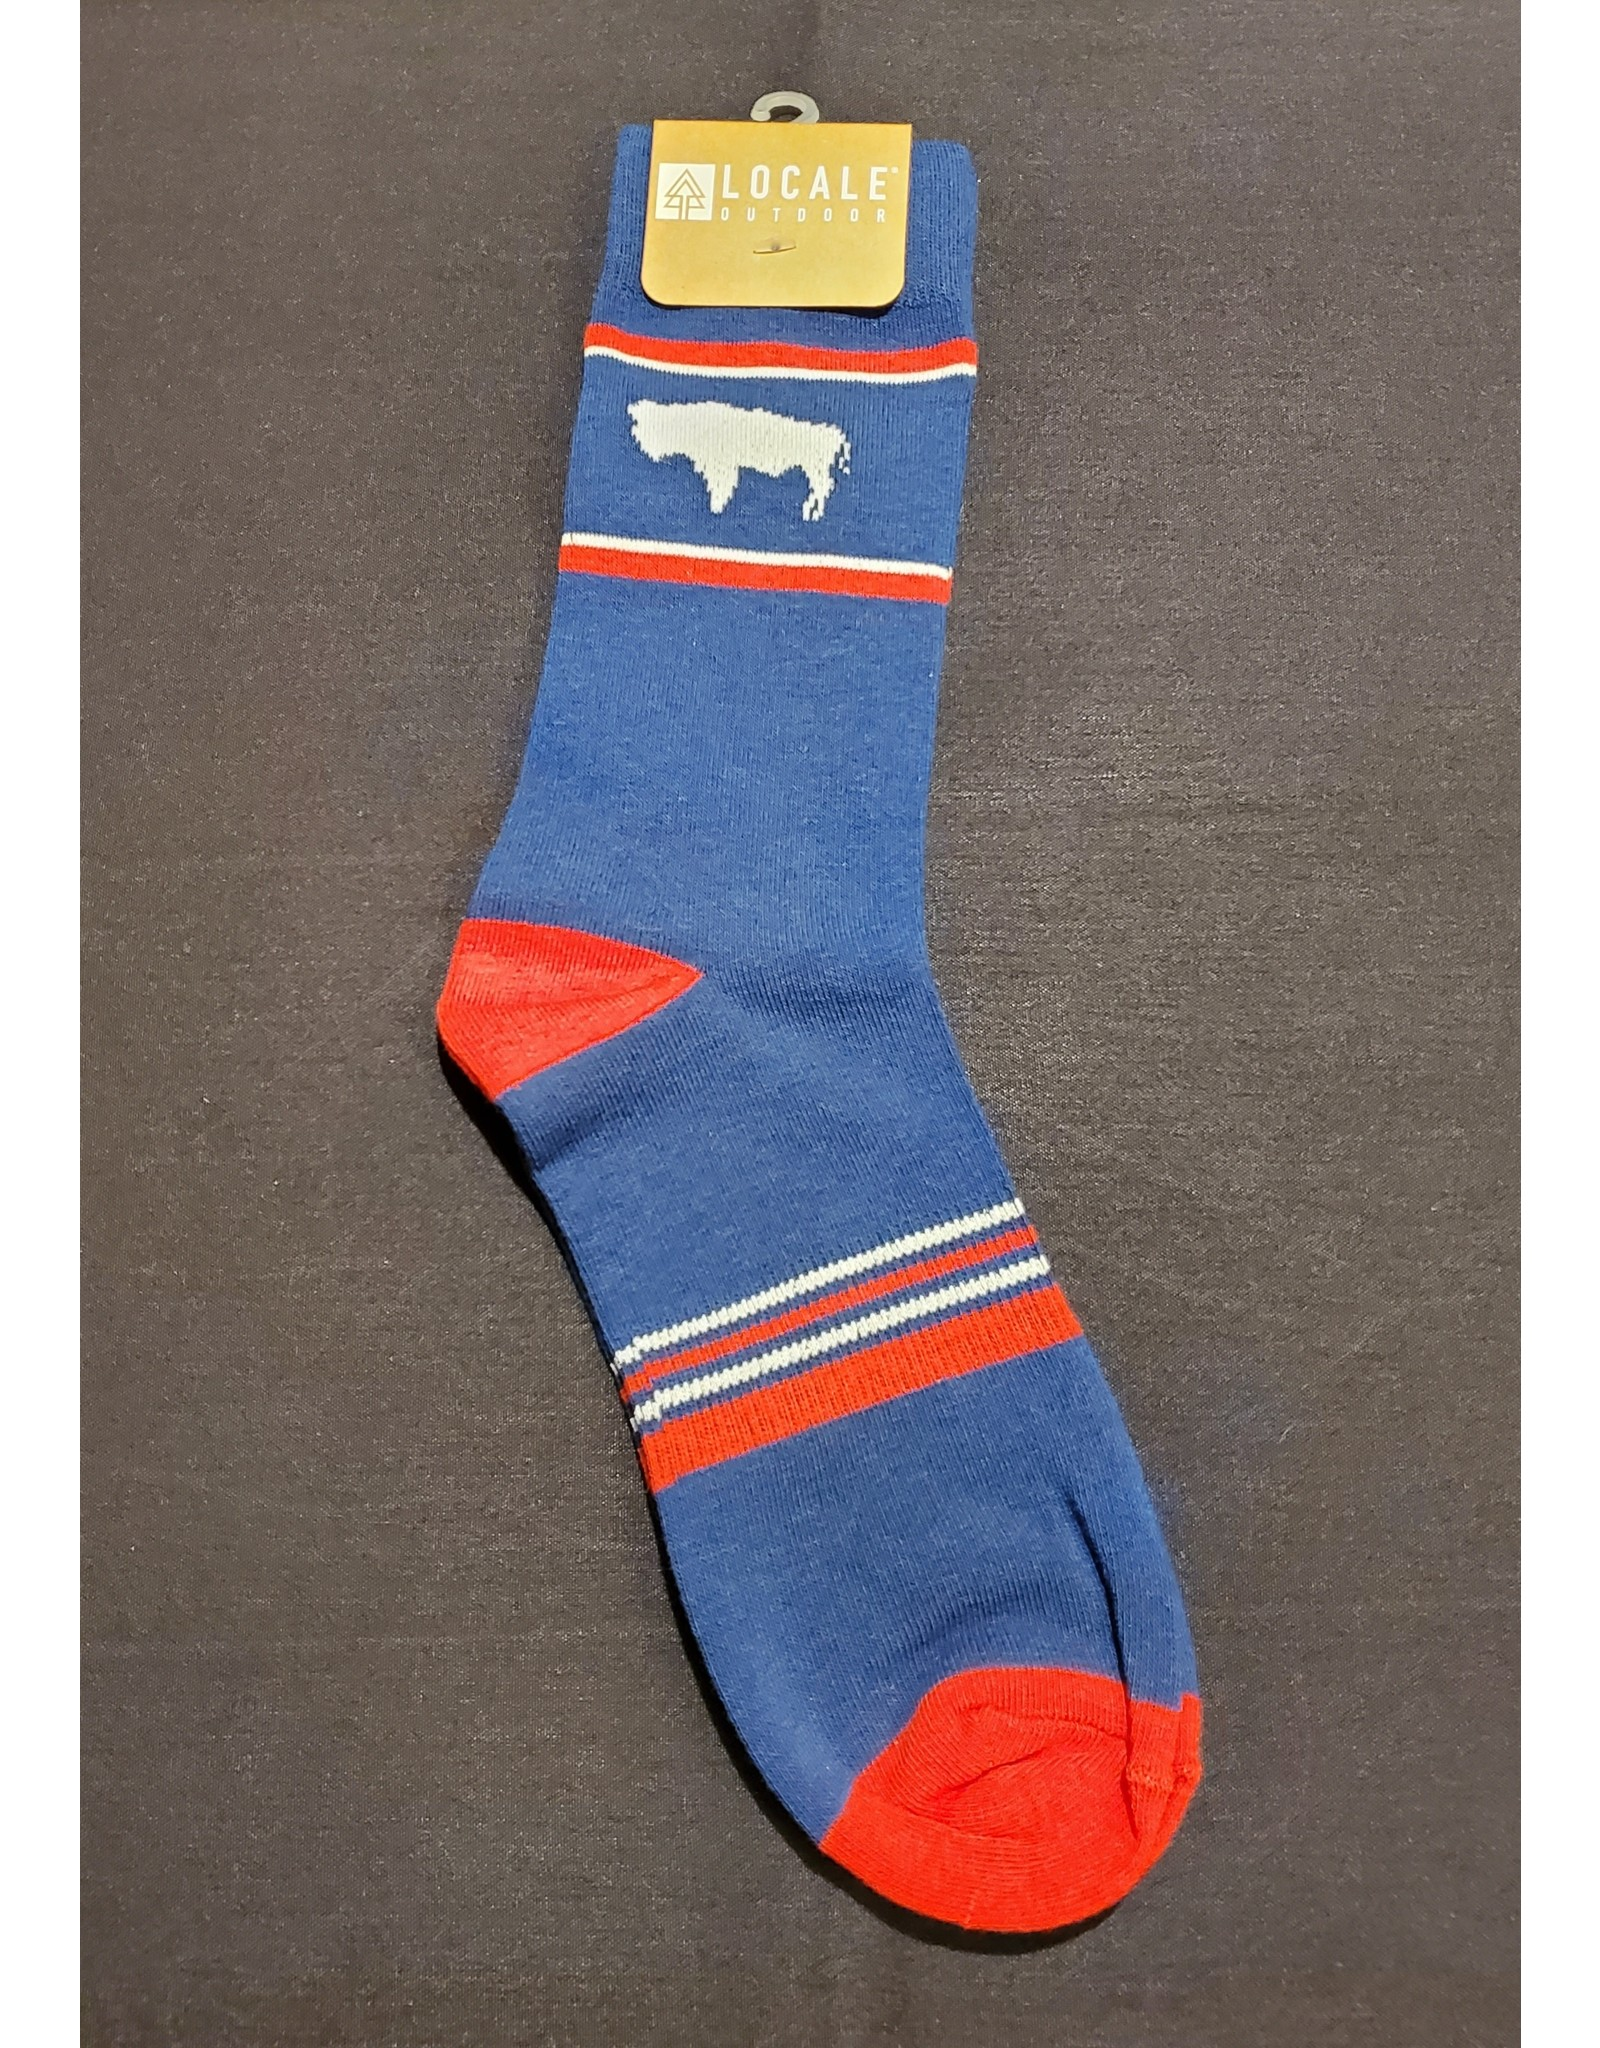 Locale Wyoming Socks